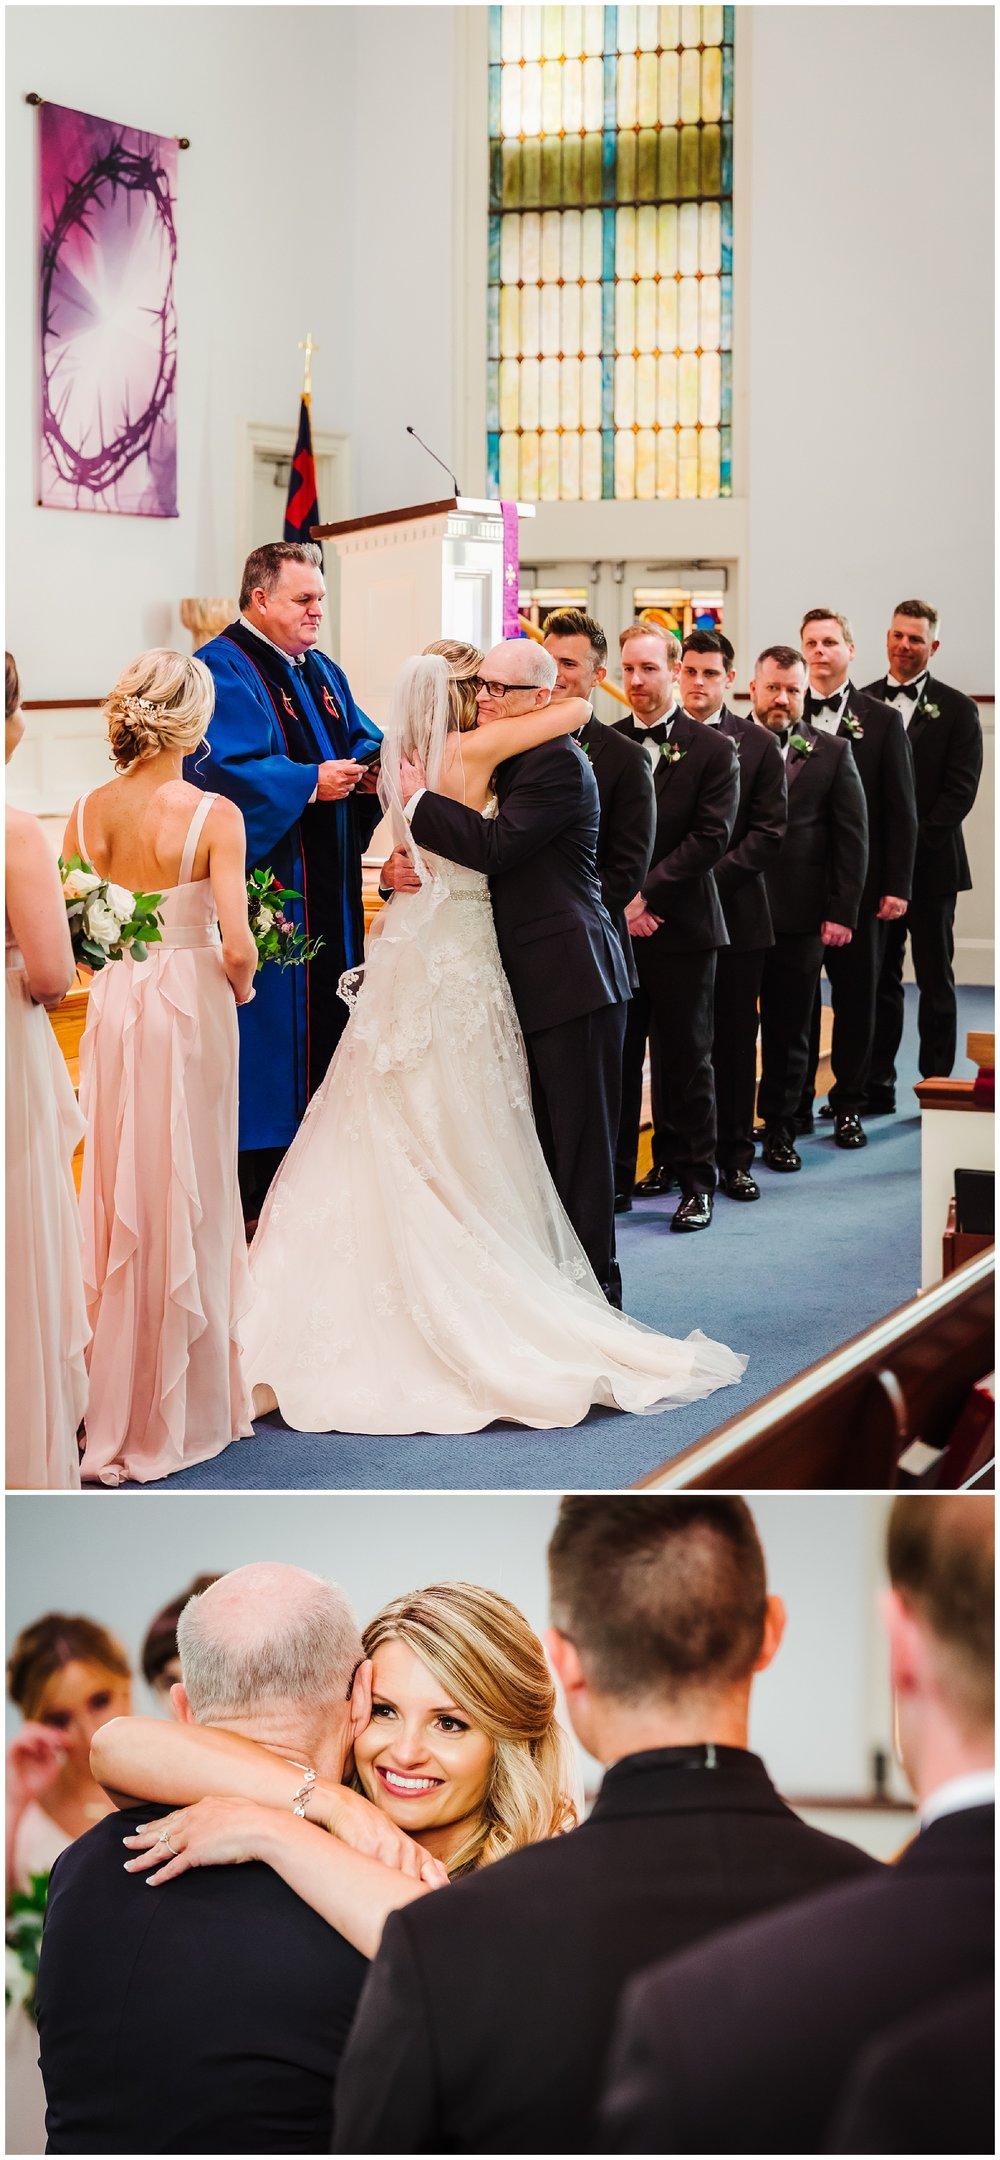 tampa-bradenton-wedding-photographer-south-florida-museum-classic-blush-gold-alpacas-sparklers_0048.jpg